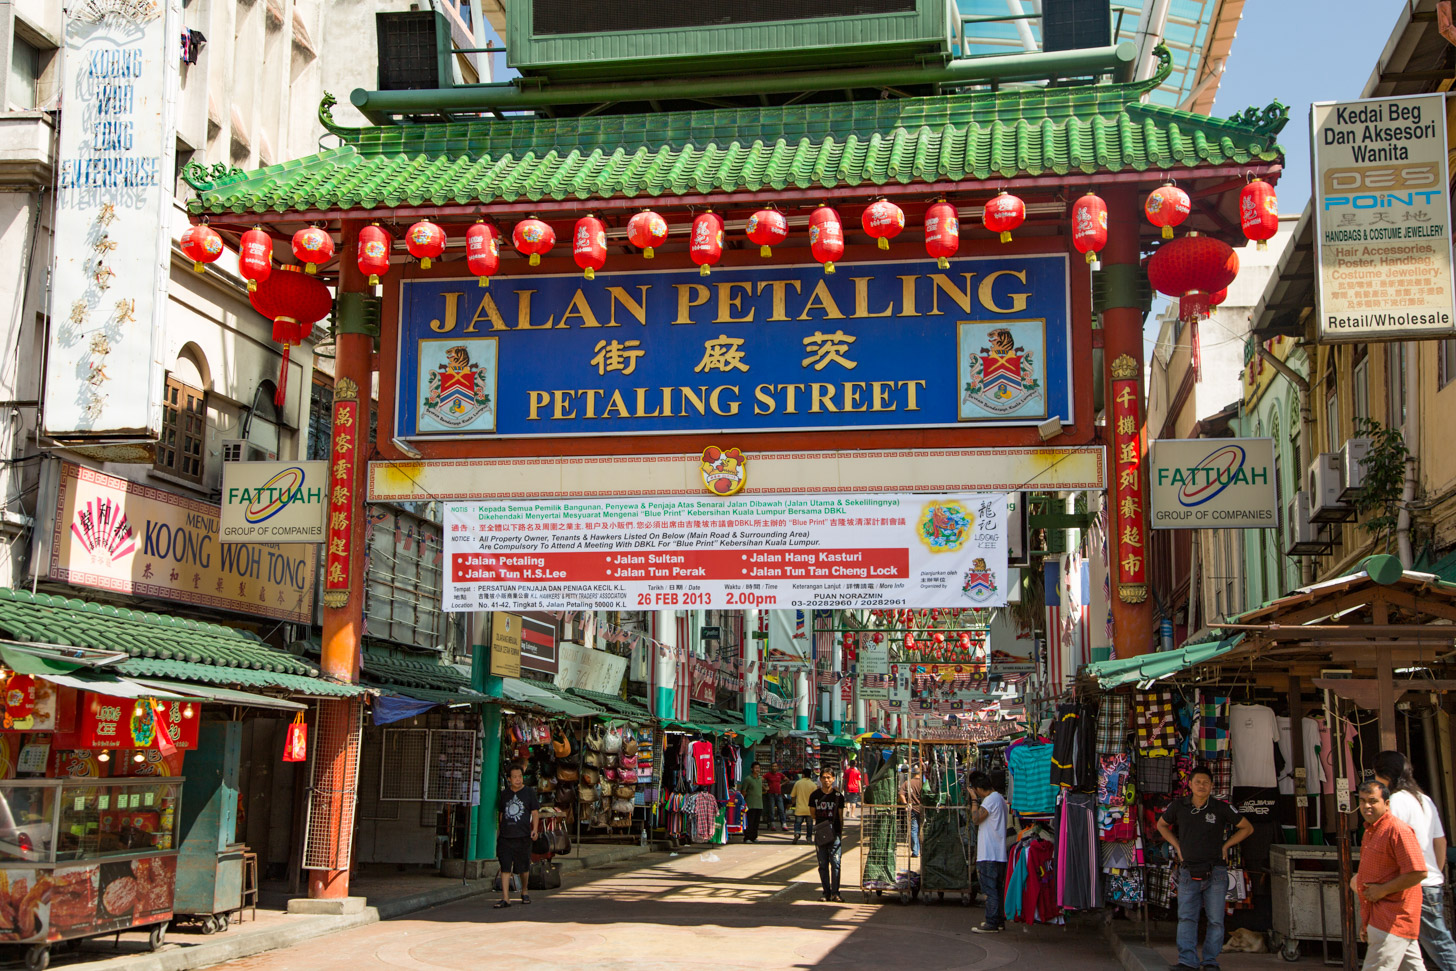 Petaling Street in Chinatown